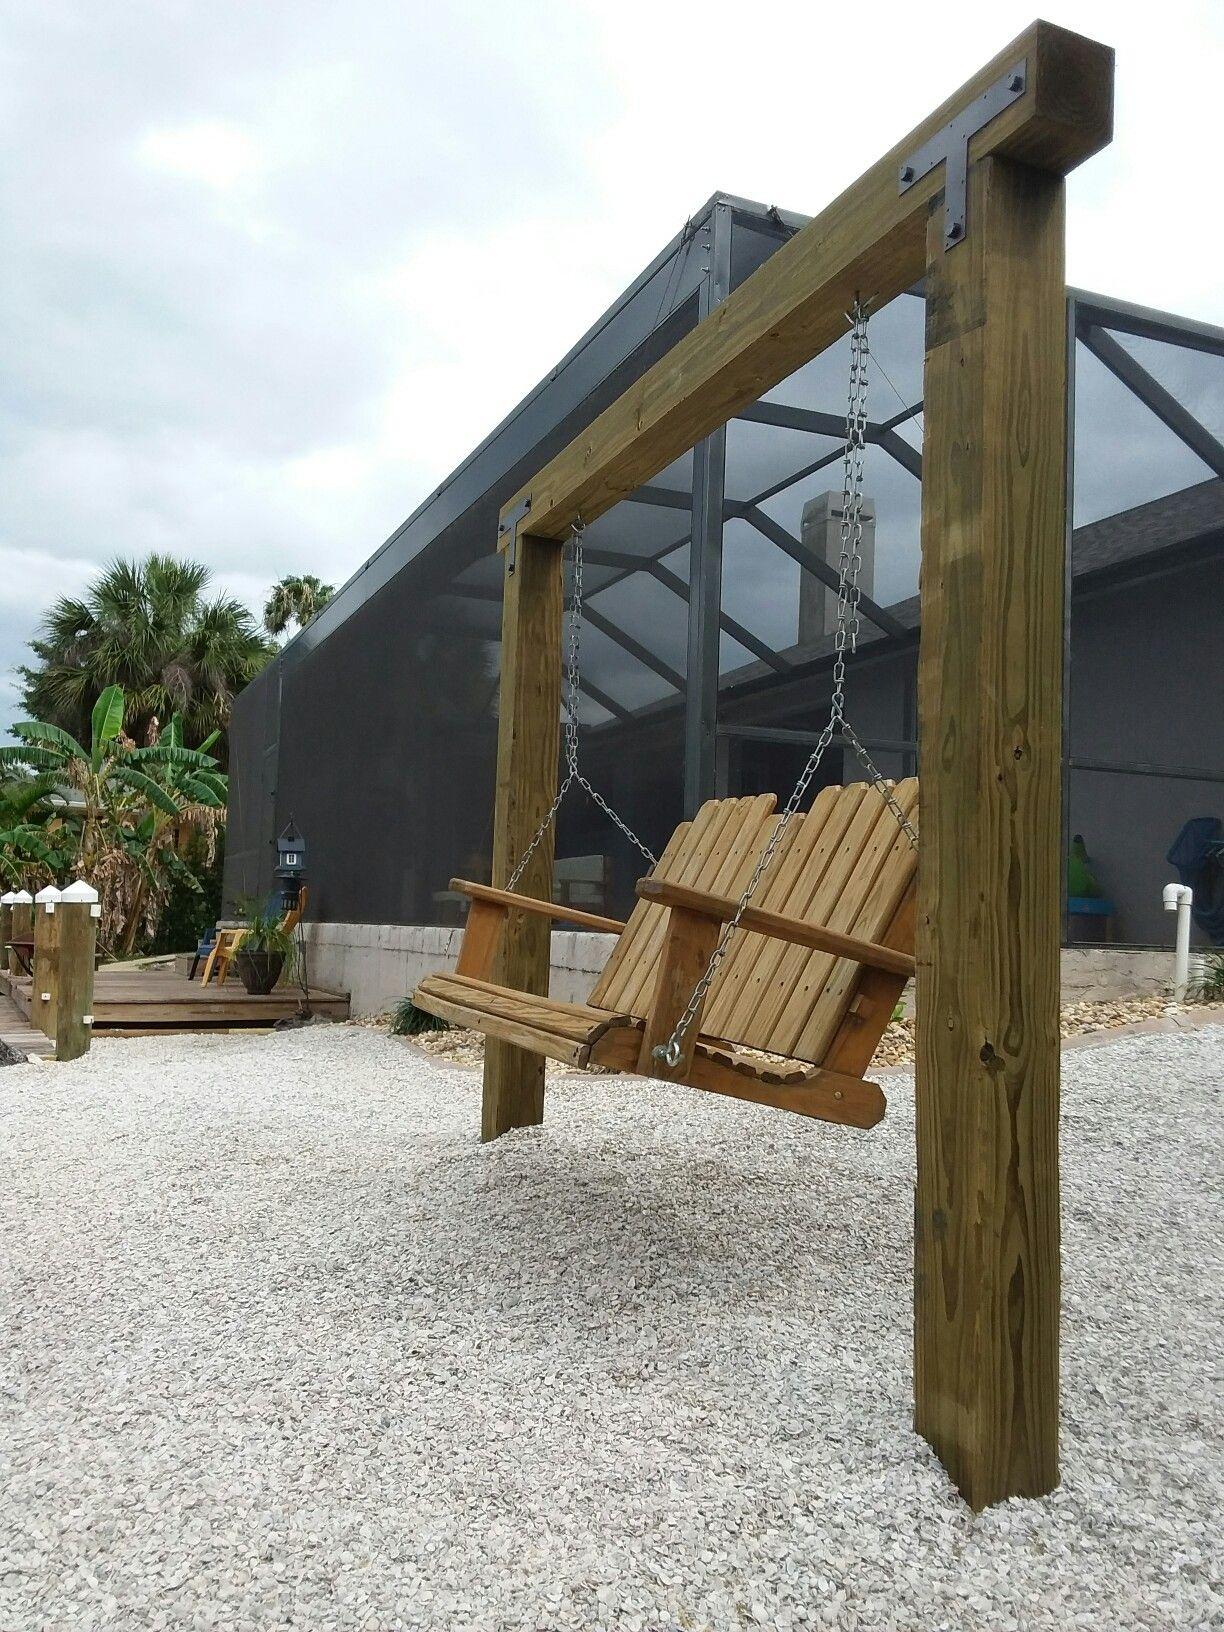 Pin by Sam Burnett on Florida House Remodel in 2019 | Backyard